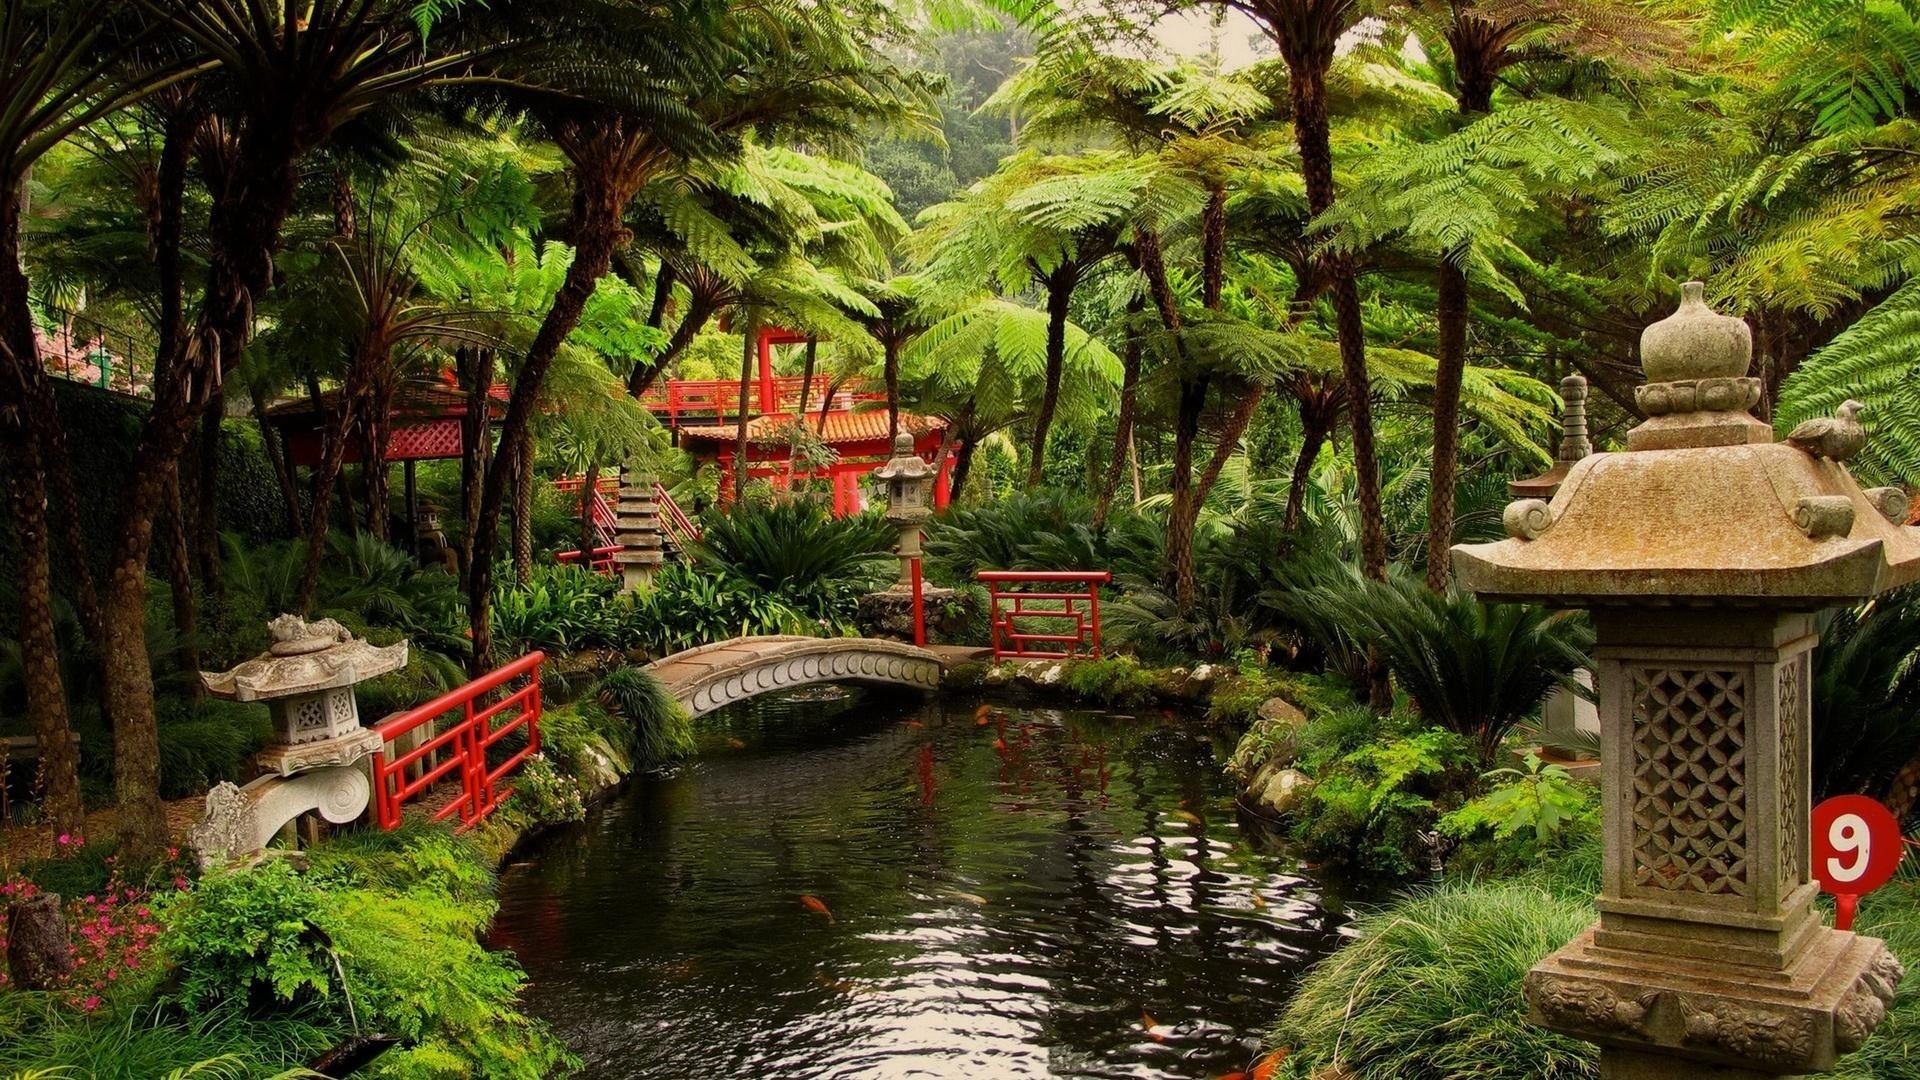 Japanese Garden wallpaper photo hd